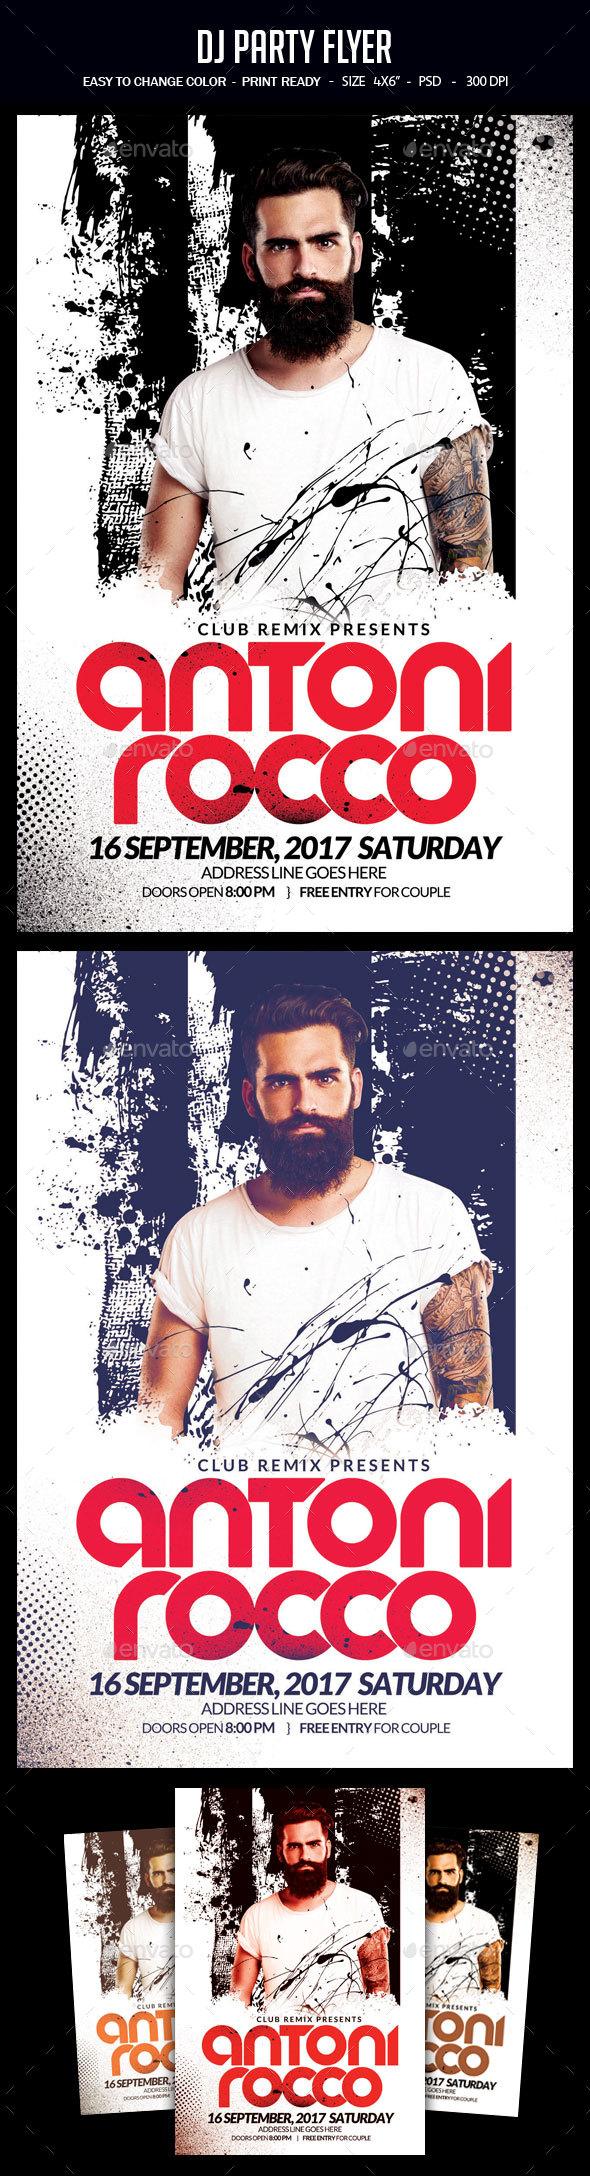 GraphicRiver DJ Party Flyer 20468389